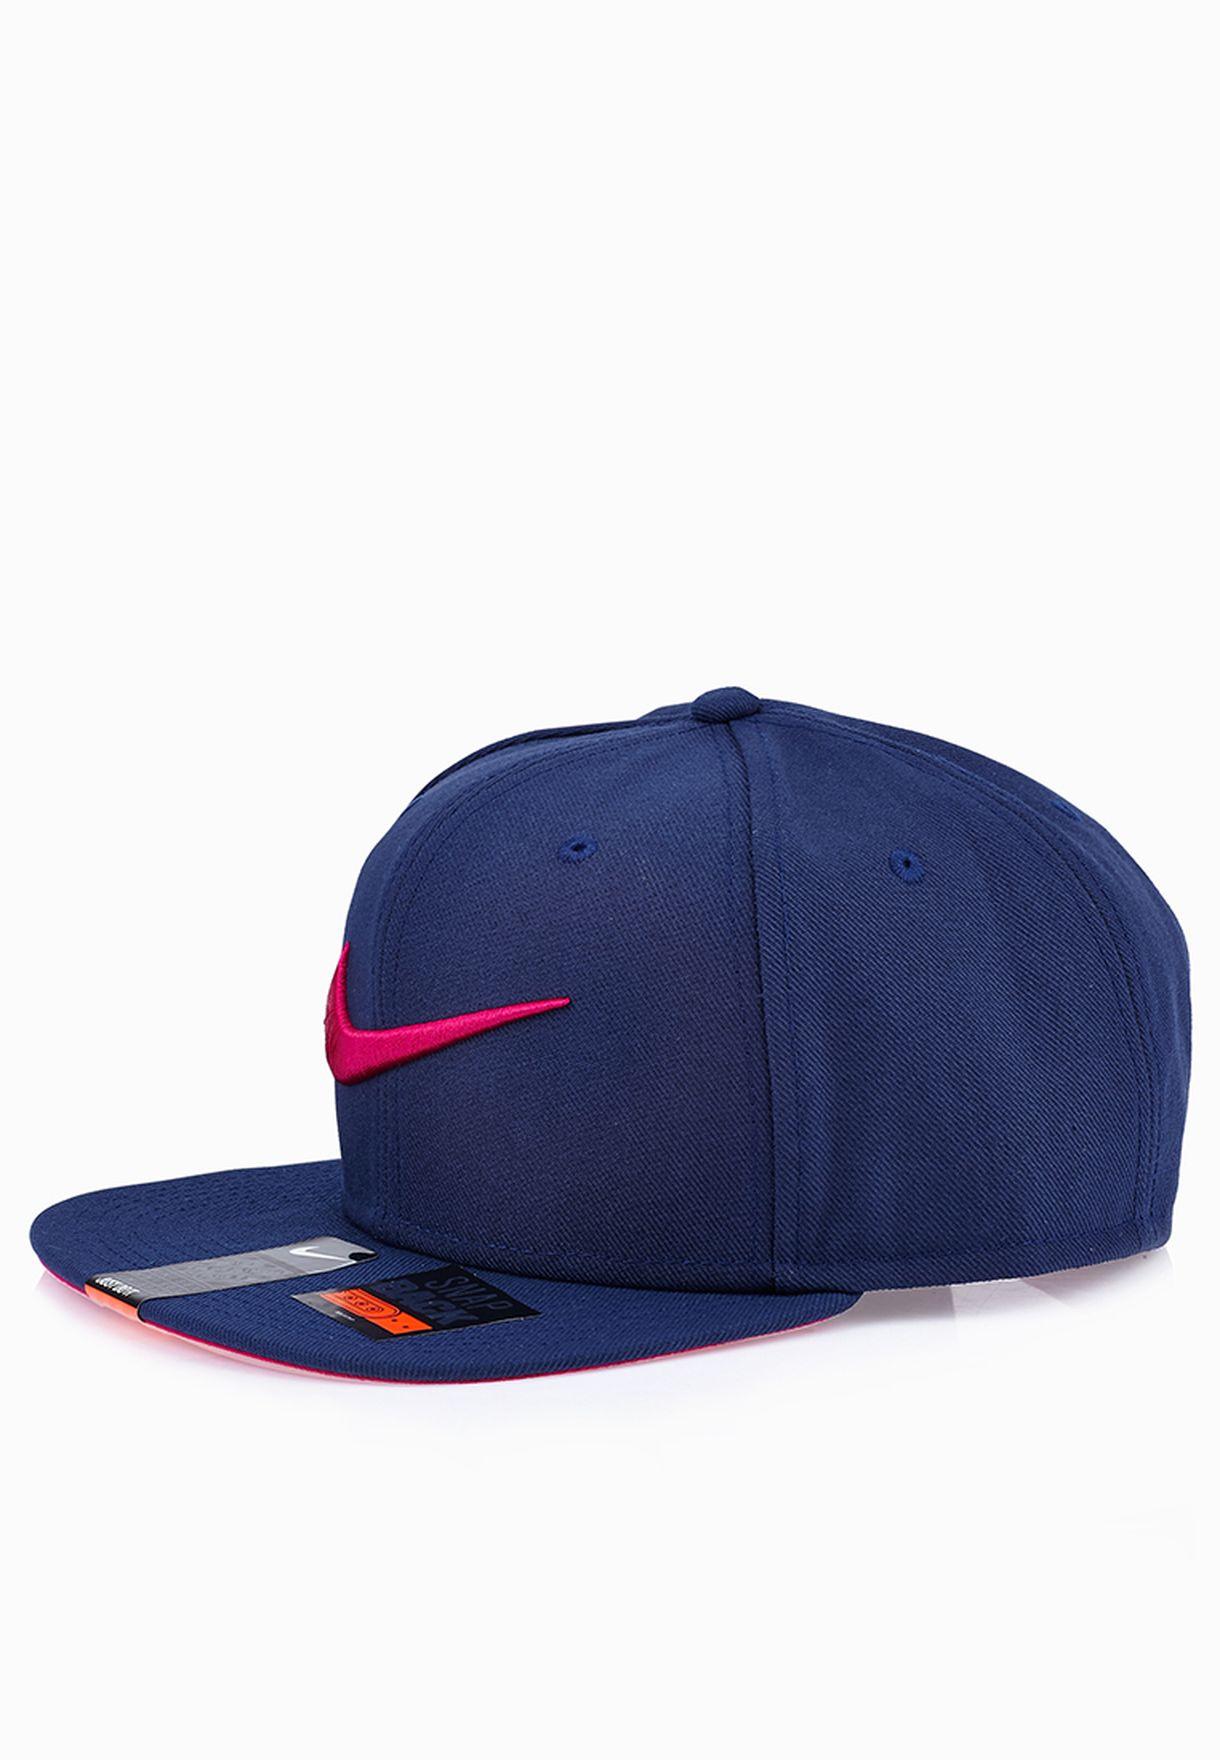 b1e6a0d255b Shop Nike blue Swoosh Pro Snapback Cap 639534-411 for Men in Kuwait -  NI727AC79FIA